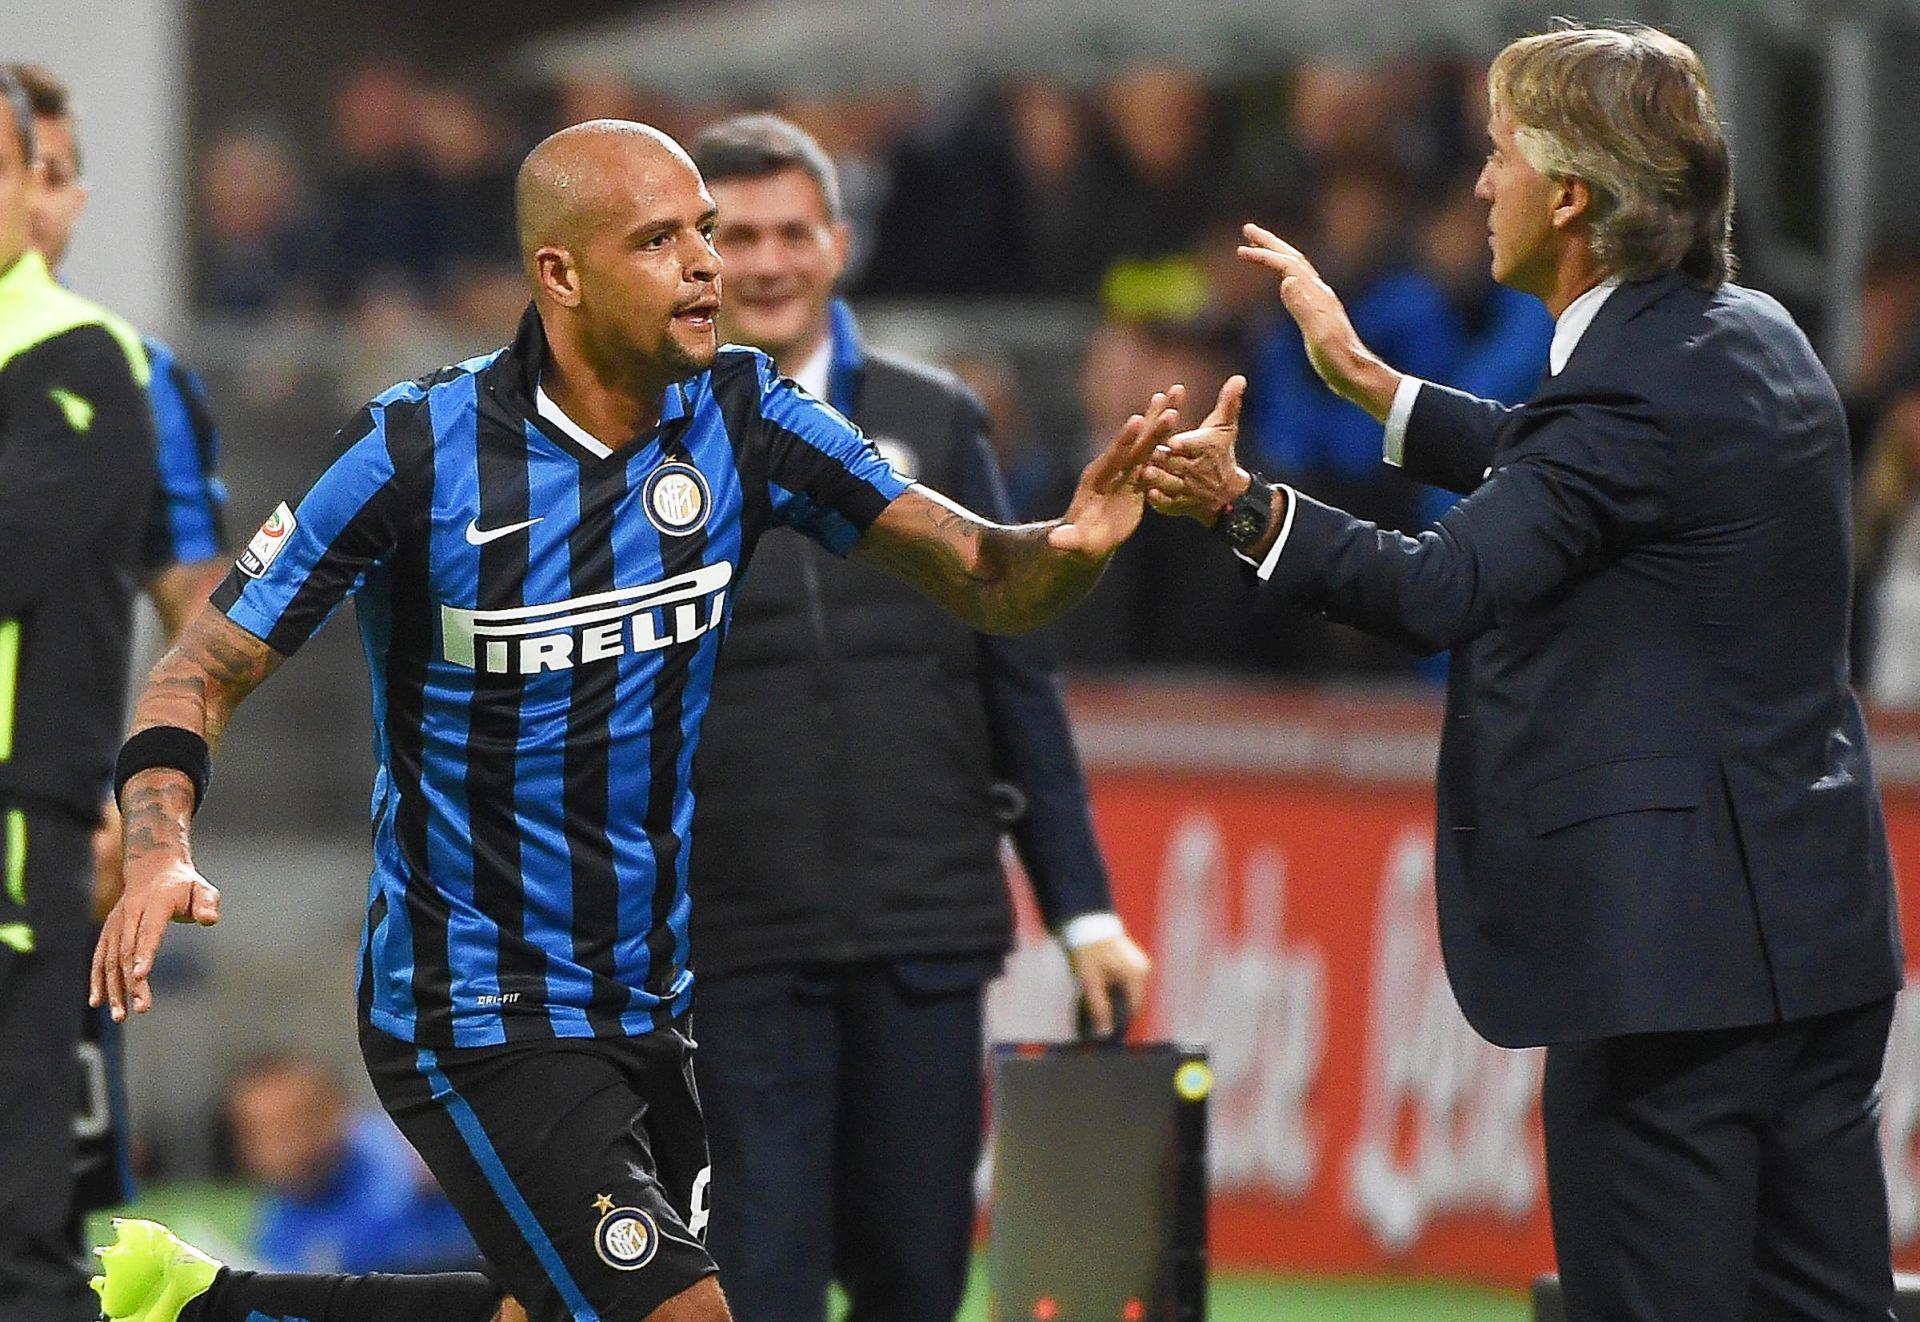 SERIE A: Juve remizirao s Frosinoneom, Kalinić strijelac za Fiorentinu, Inter stopostotan